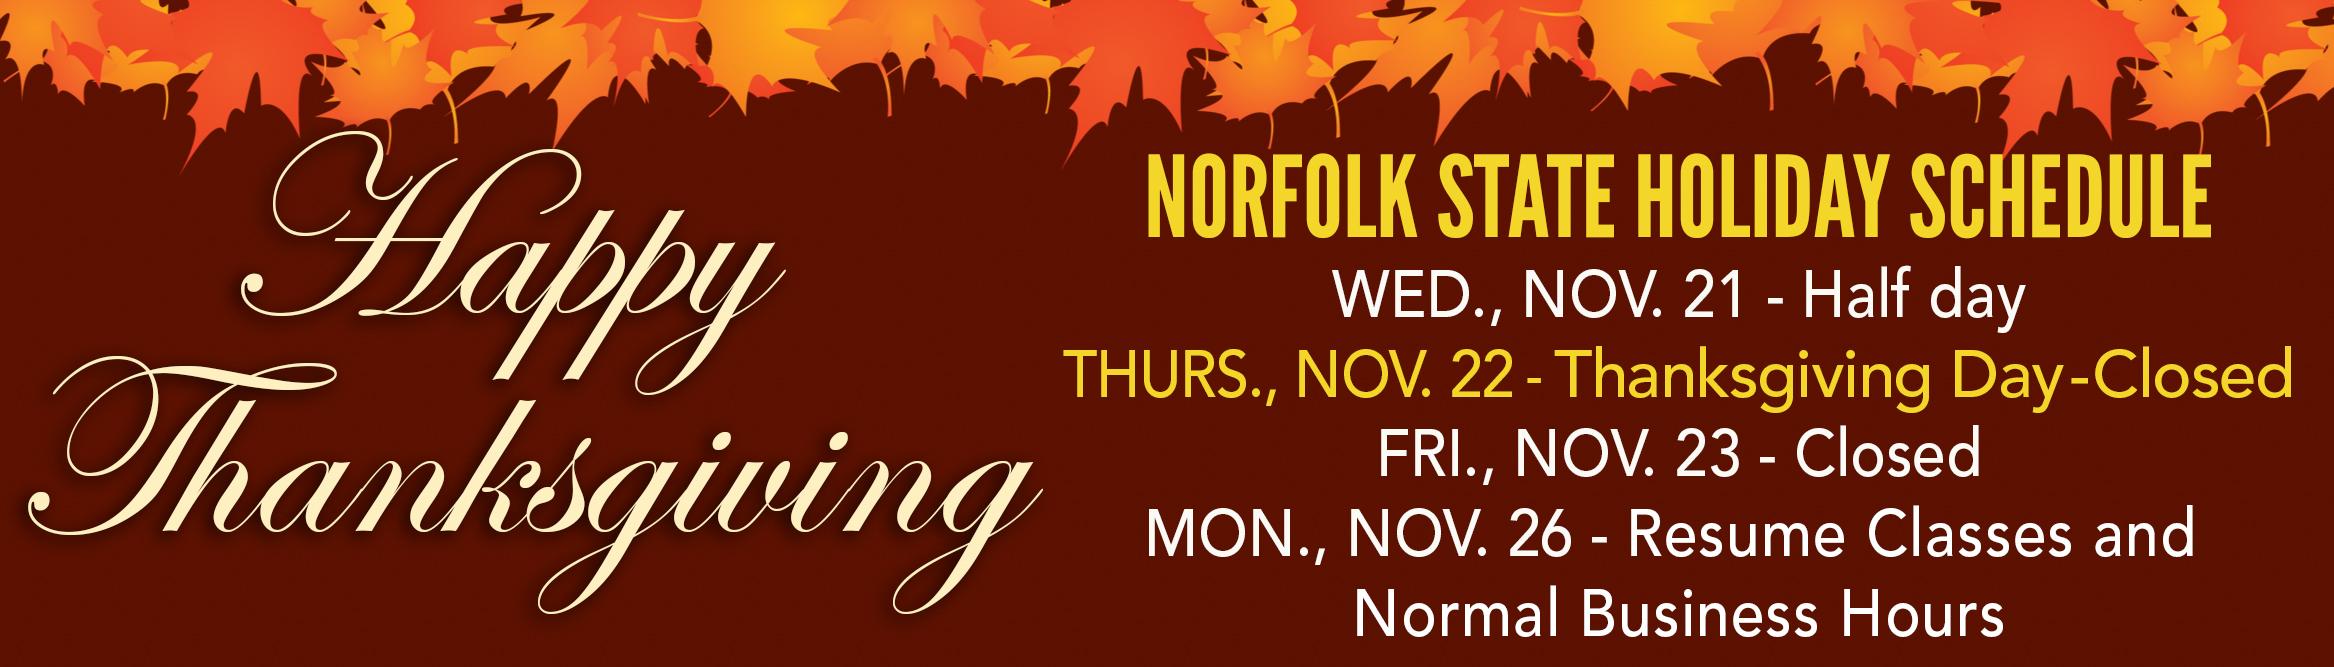 Thanksgiving Holiday Schedule Norfolk State University